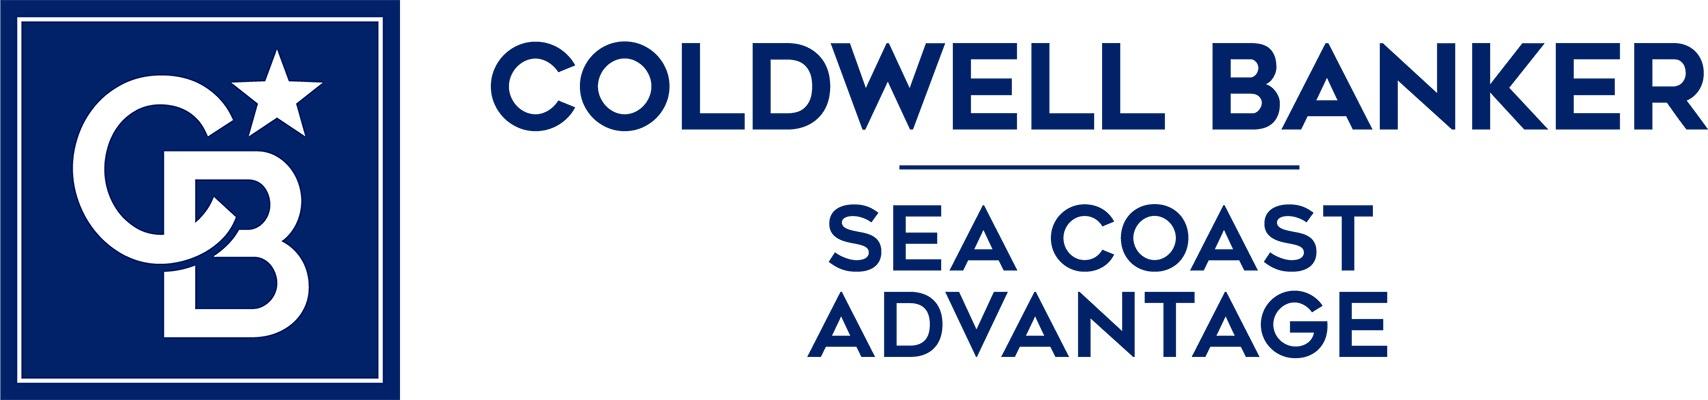 Tina Karimi - Coldwell Banker Sea Coast Advantage Realty Logo